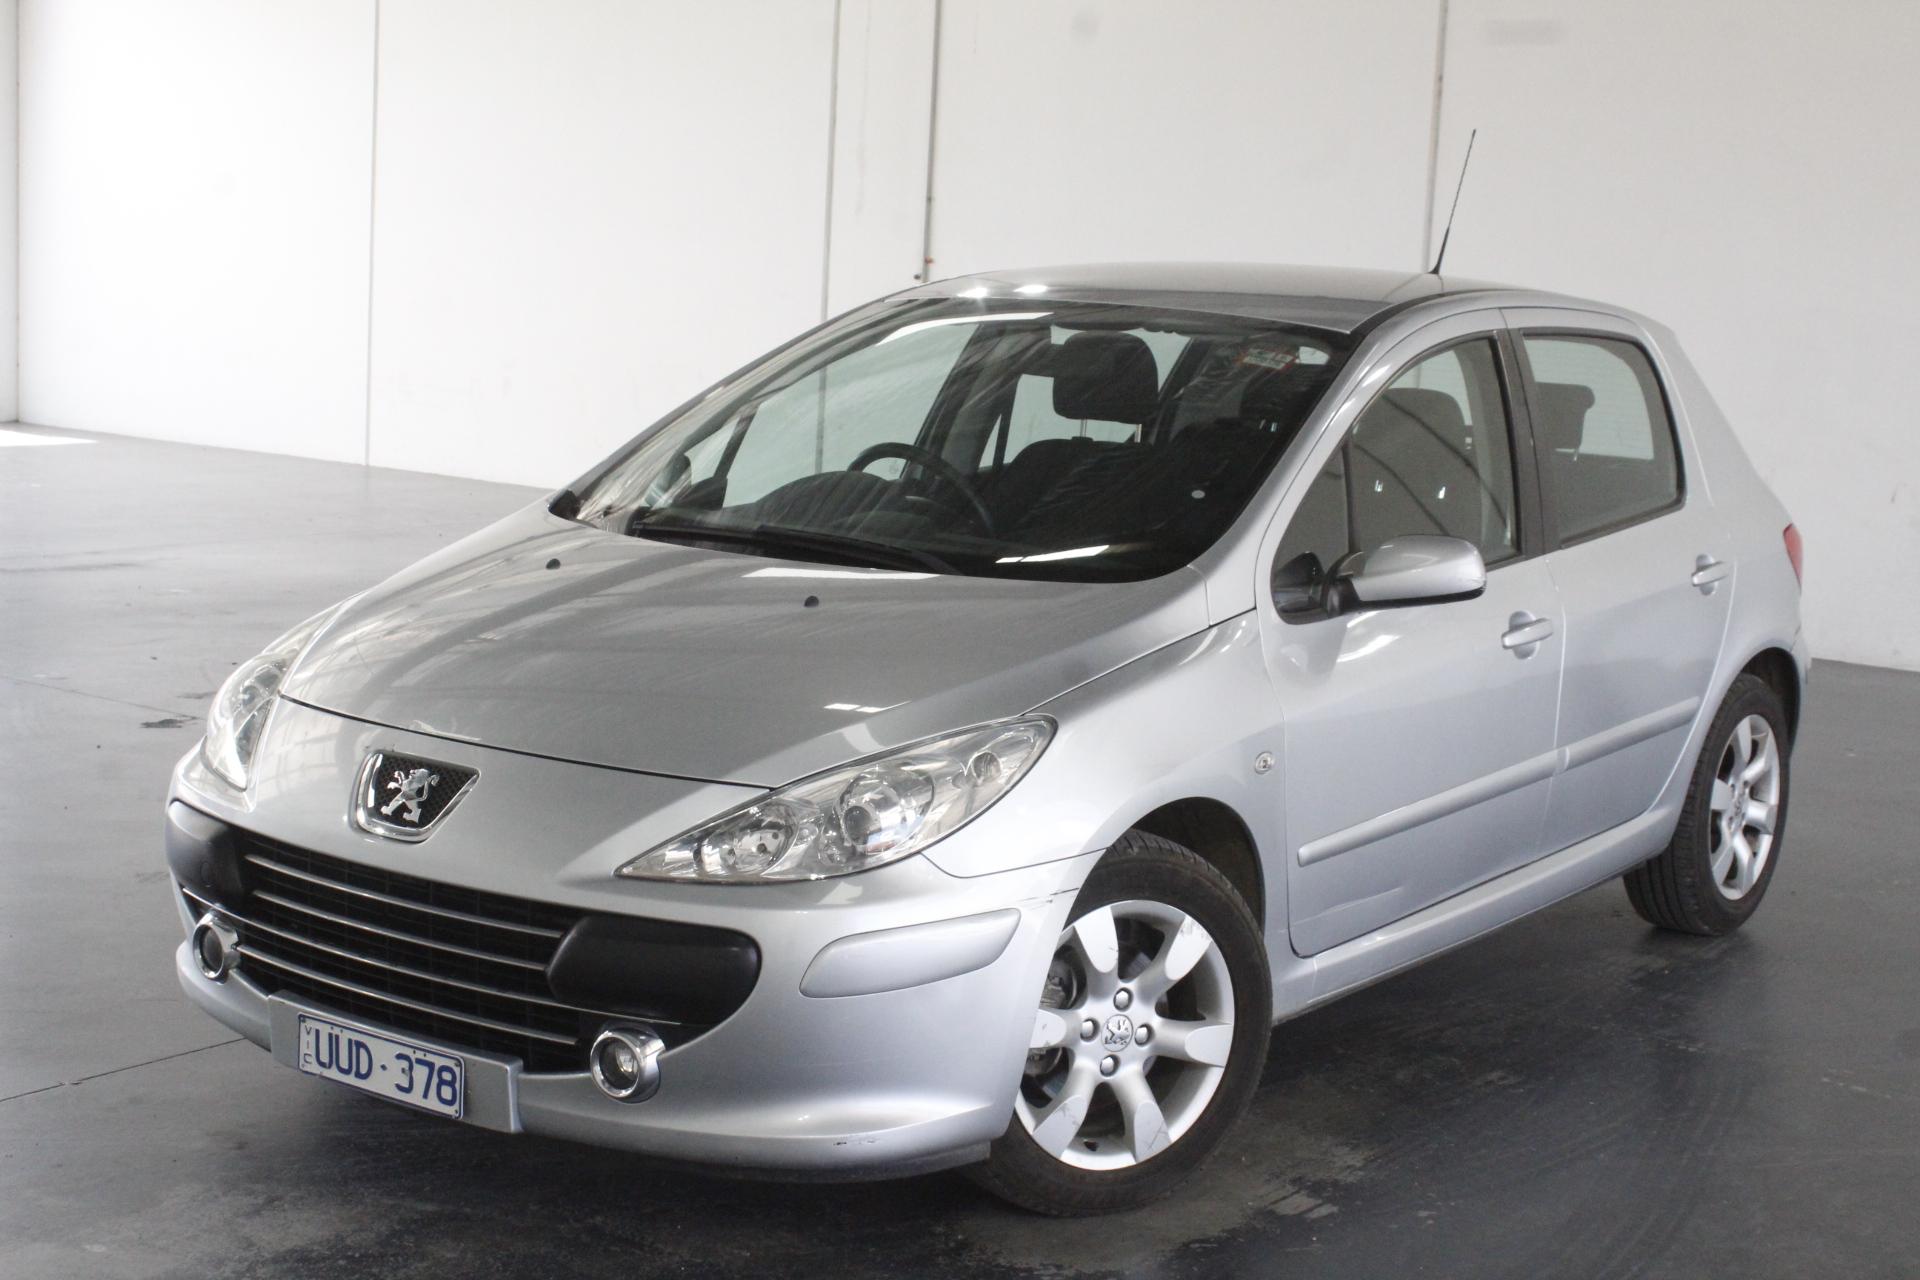 2007 Peugeot 307 XS 1.6 Automatic Hatchback